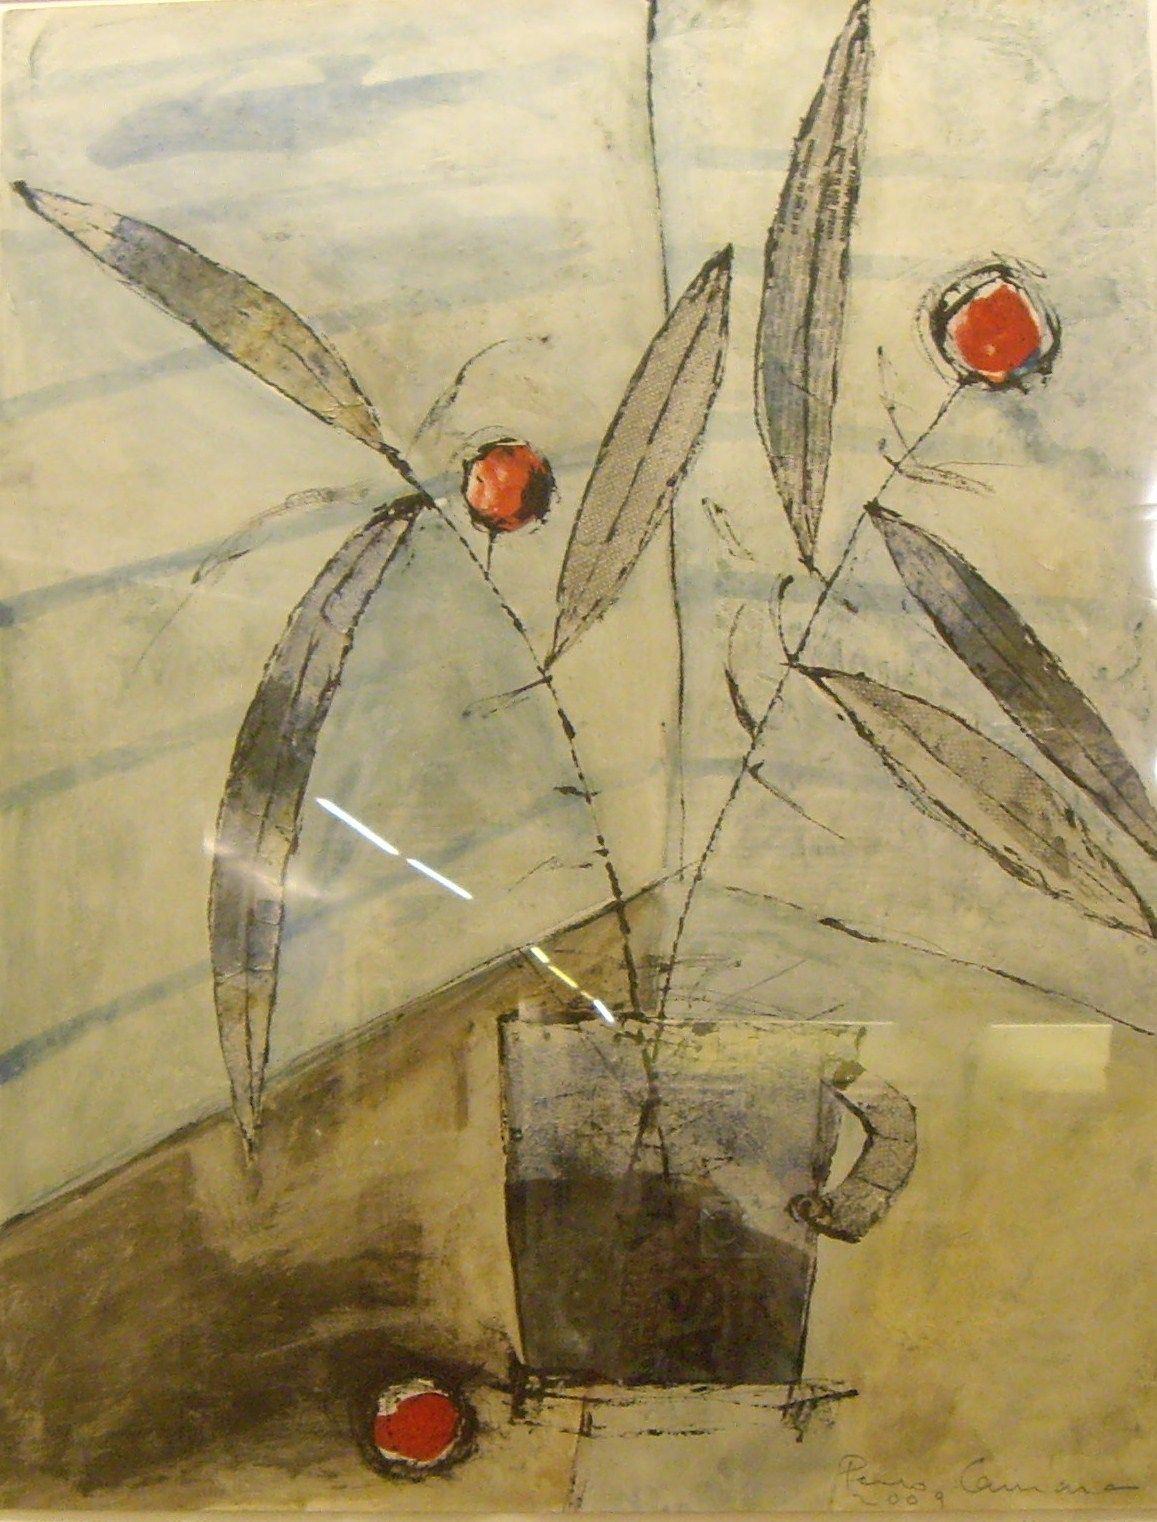 Eucalipto. Paco Camara | ART PACO CAMARA. CUADROS & MUEBLES | Pinterest